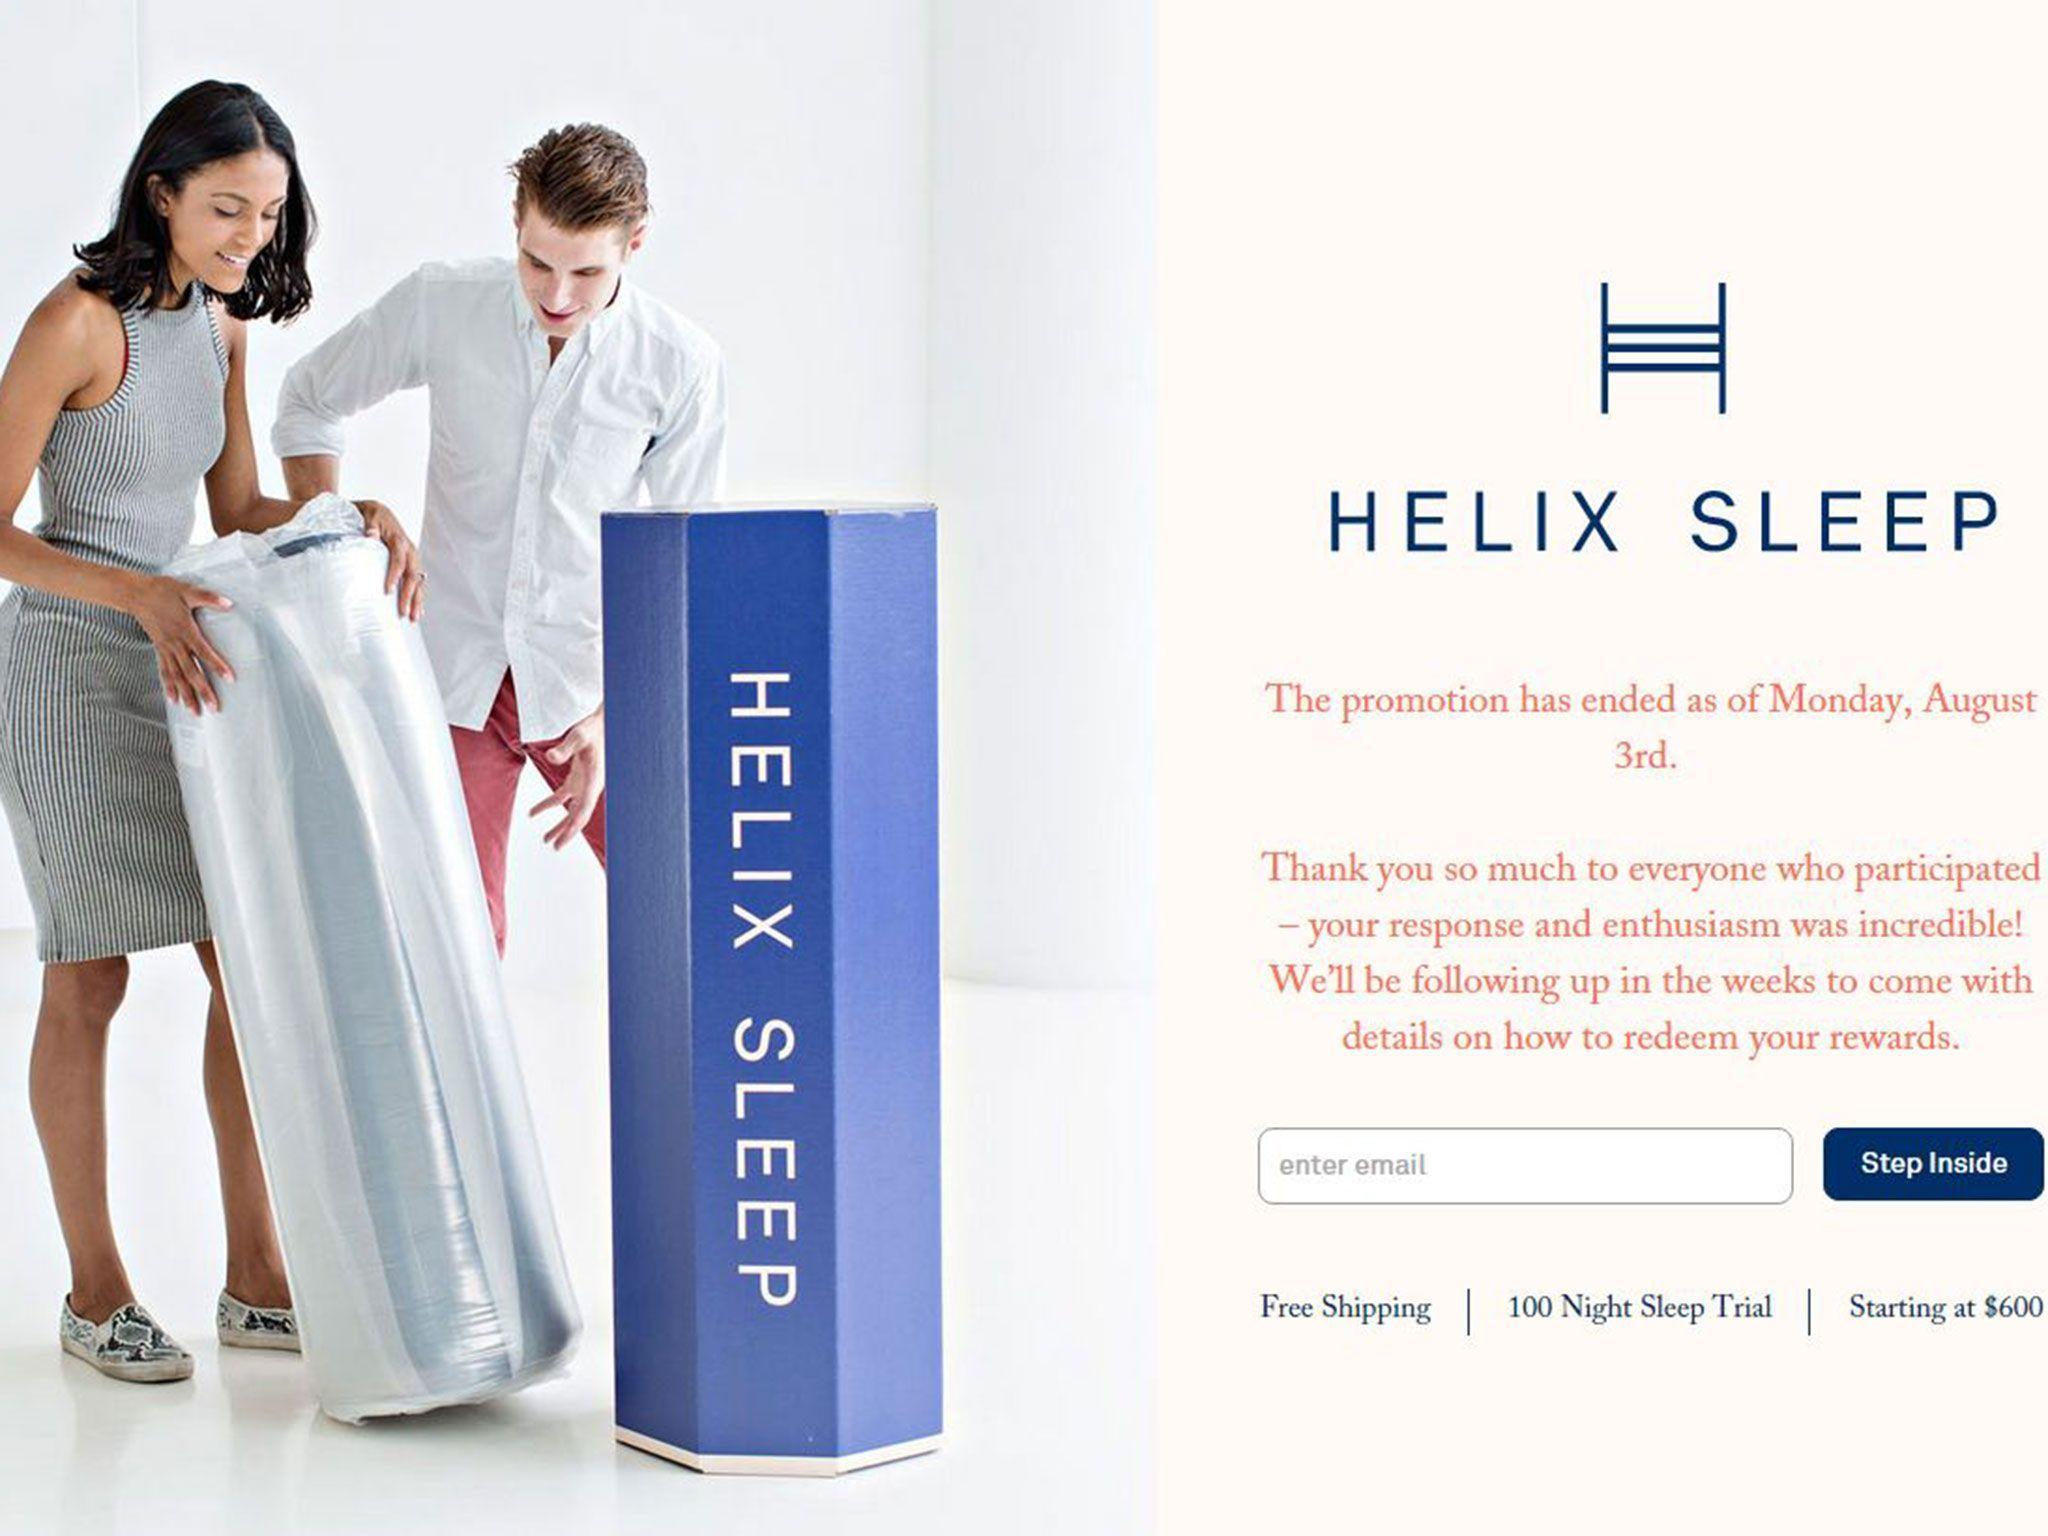 10 Best Places To Buy A Mattress Online Page 5 Online Mattress Helix Sleep Online